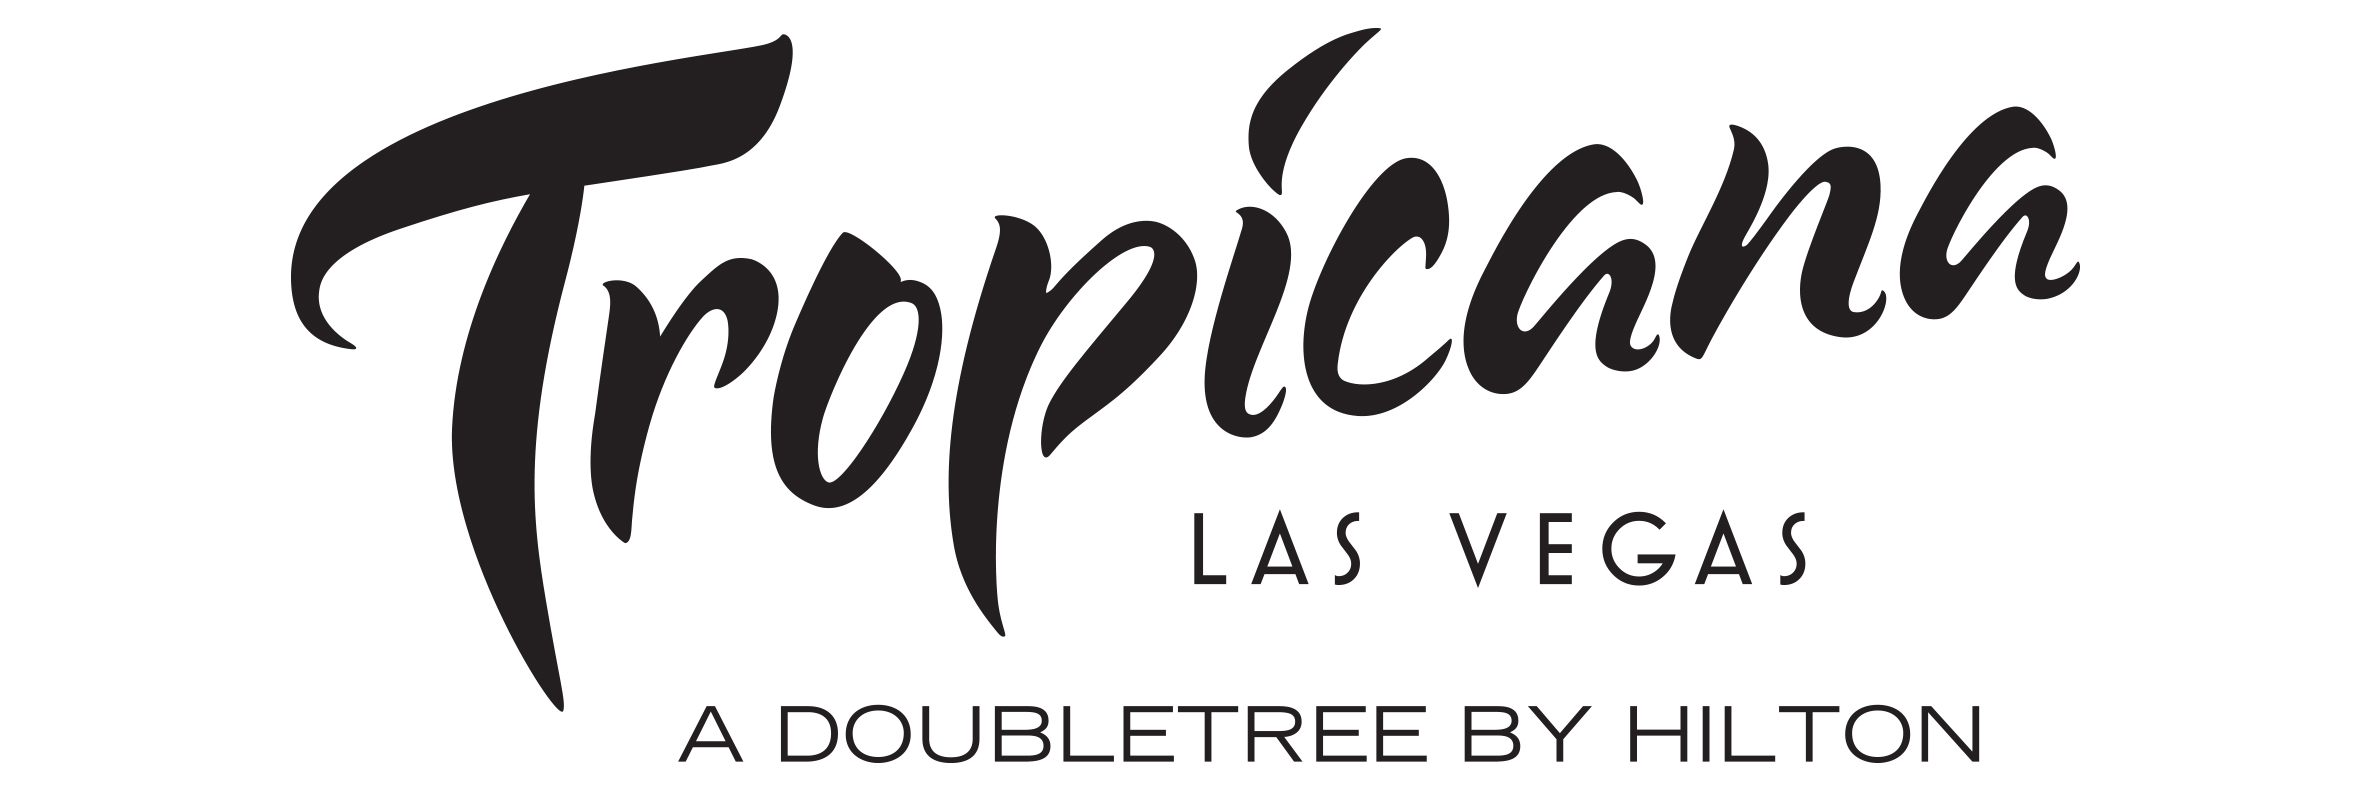 Tropicana Las Vegas - A Doubletree by Hilton logo